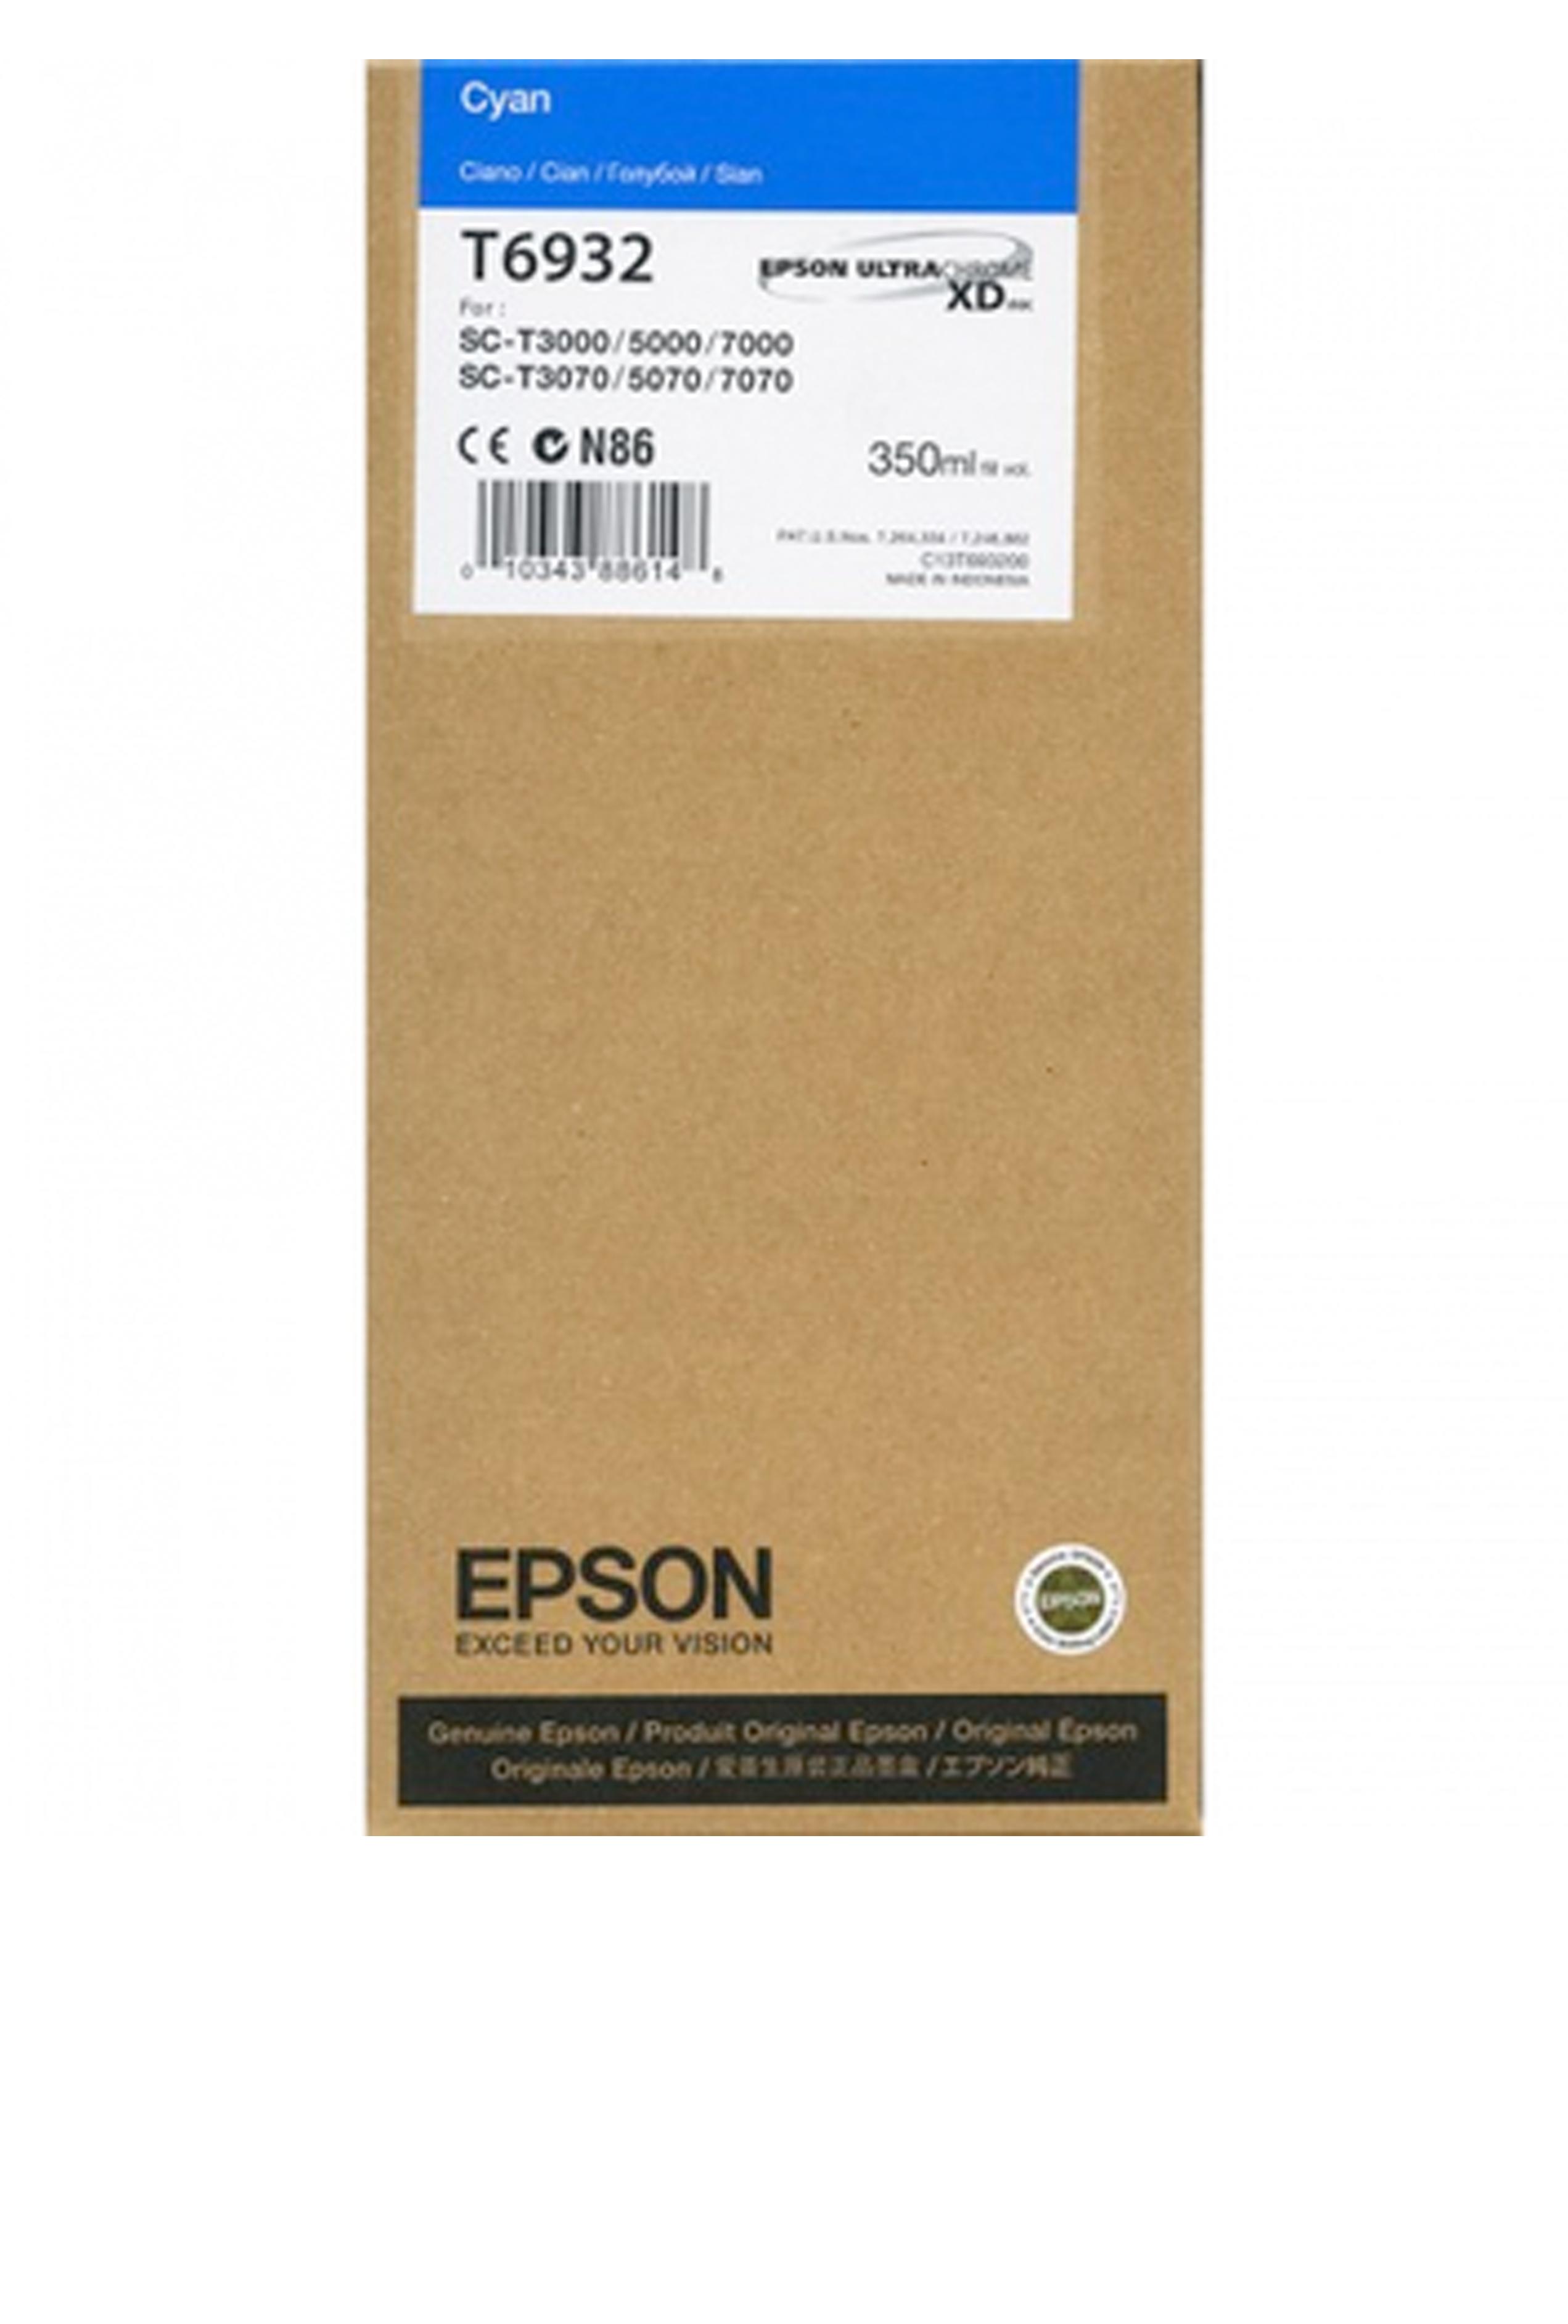 Epson EPSON SD CYAN INK (350 ML) (T693200)